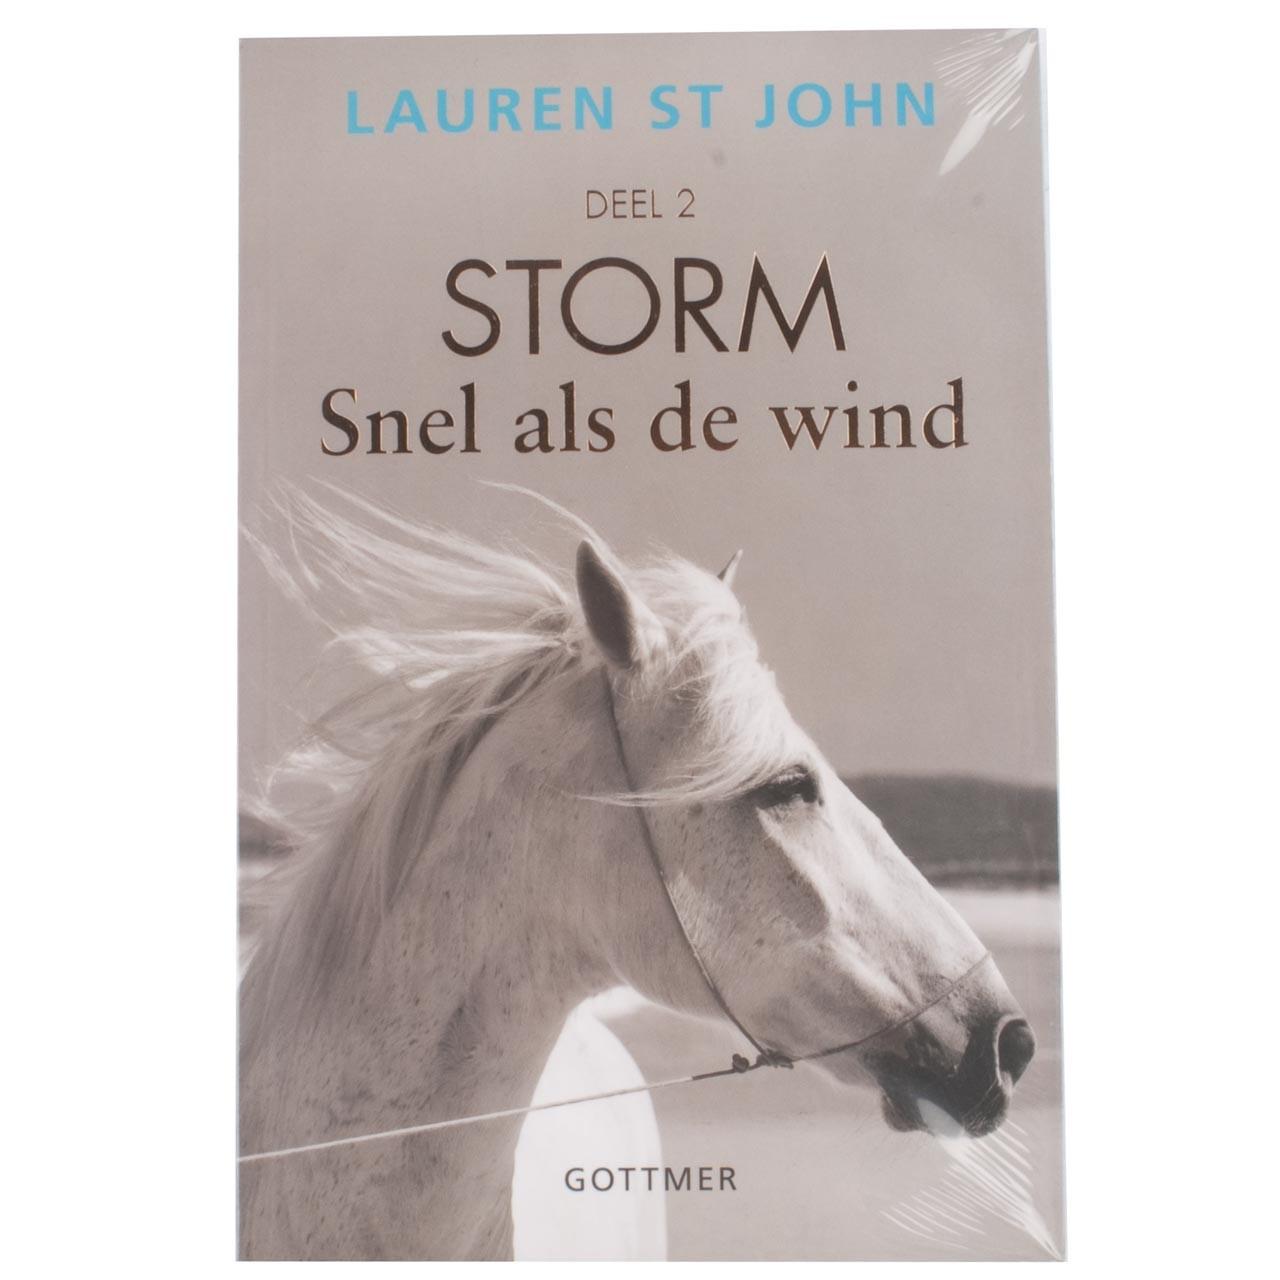 Storm, snel als de wind